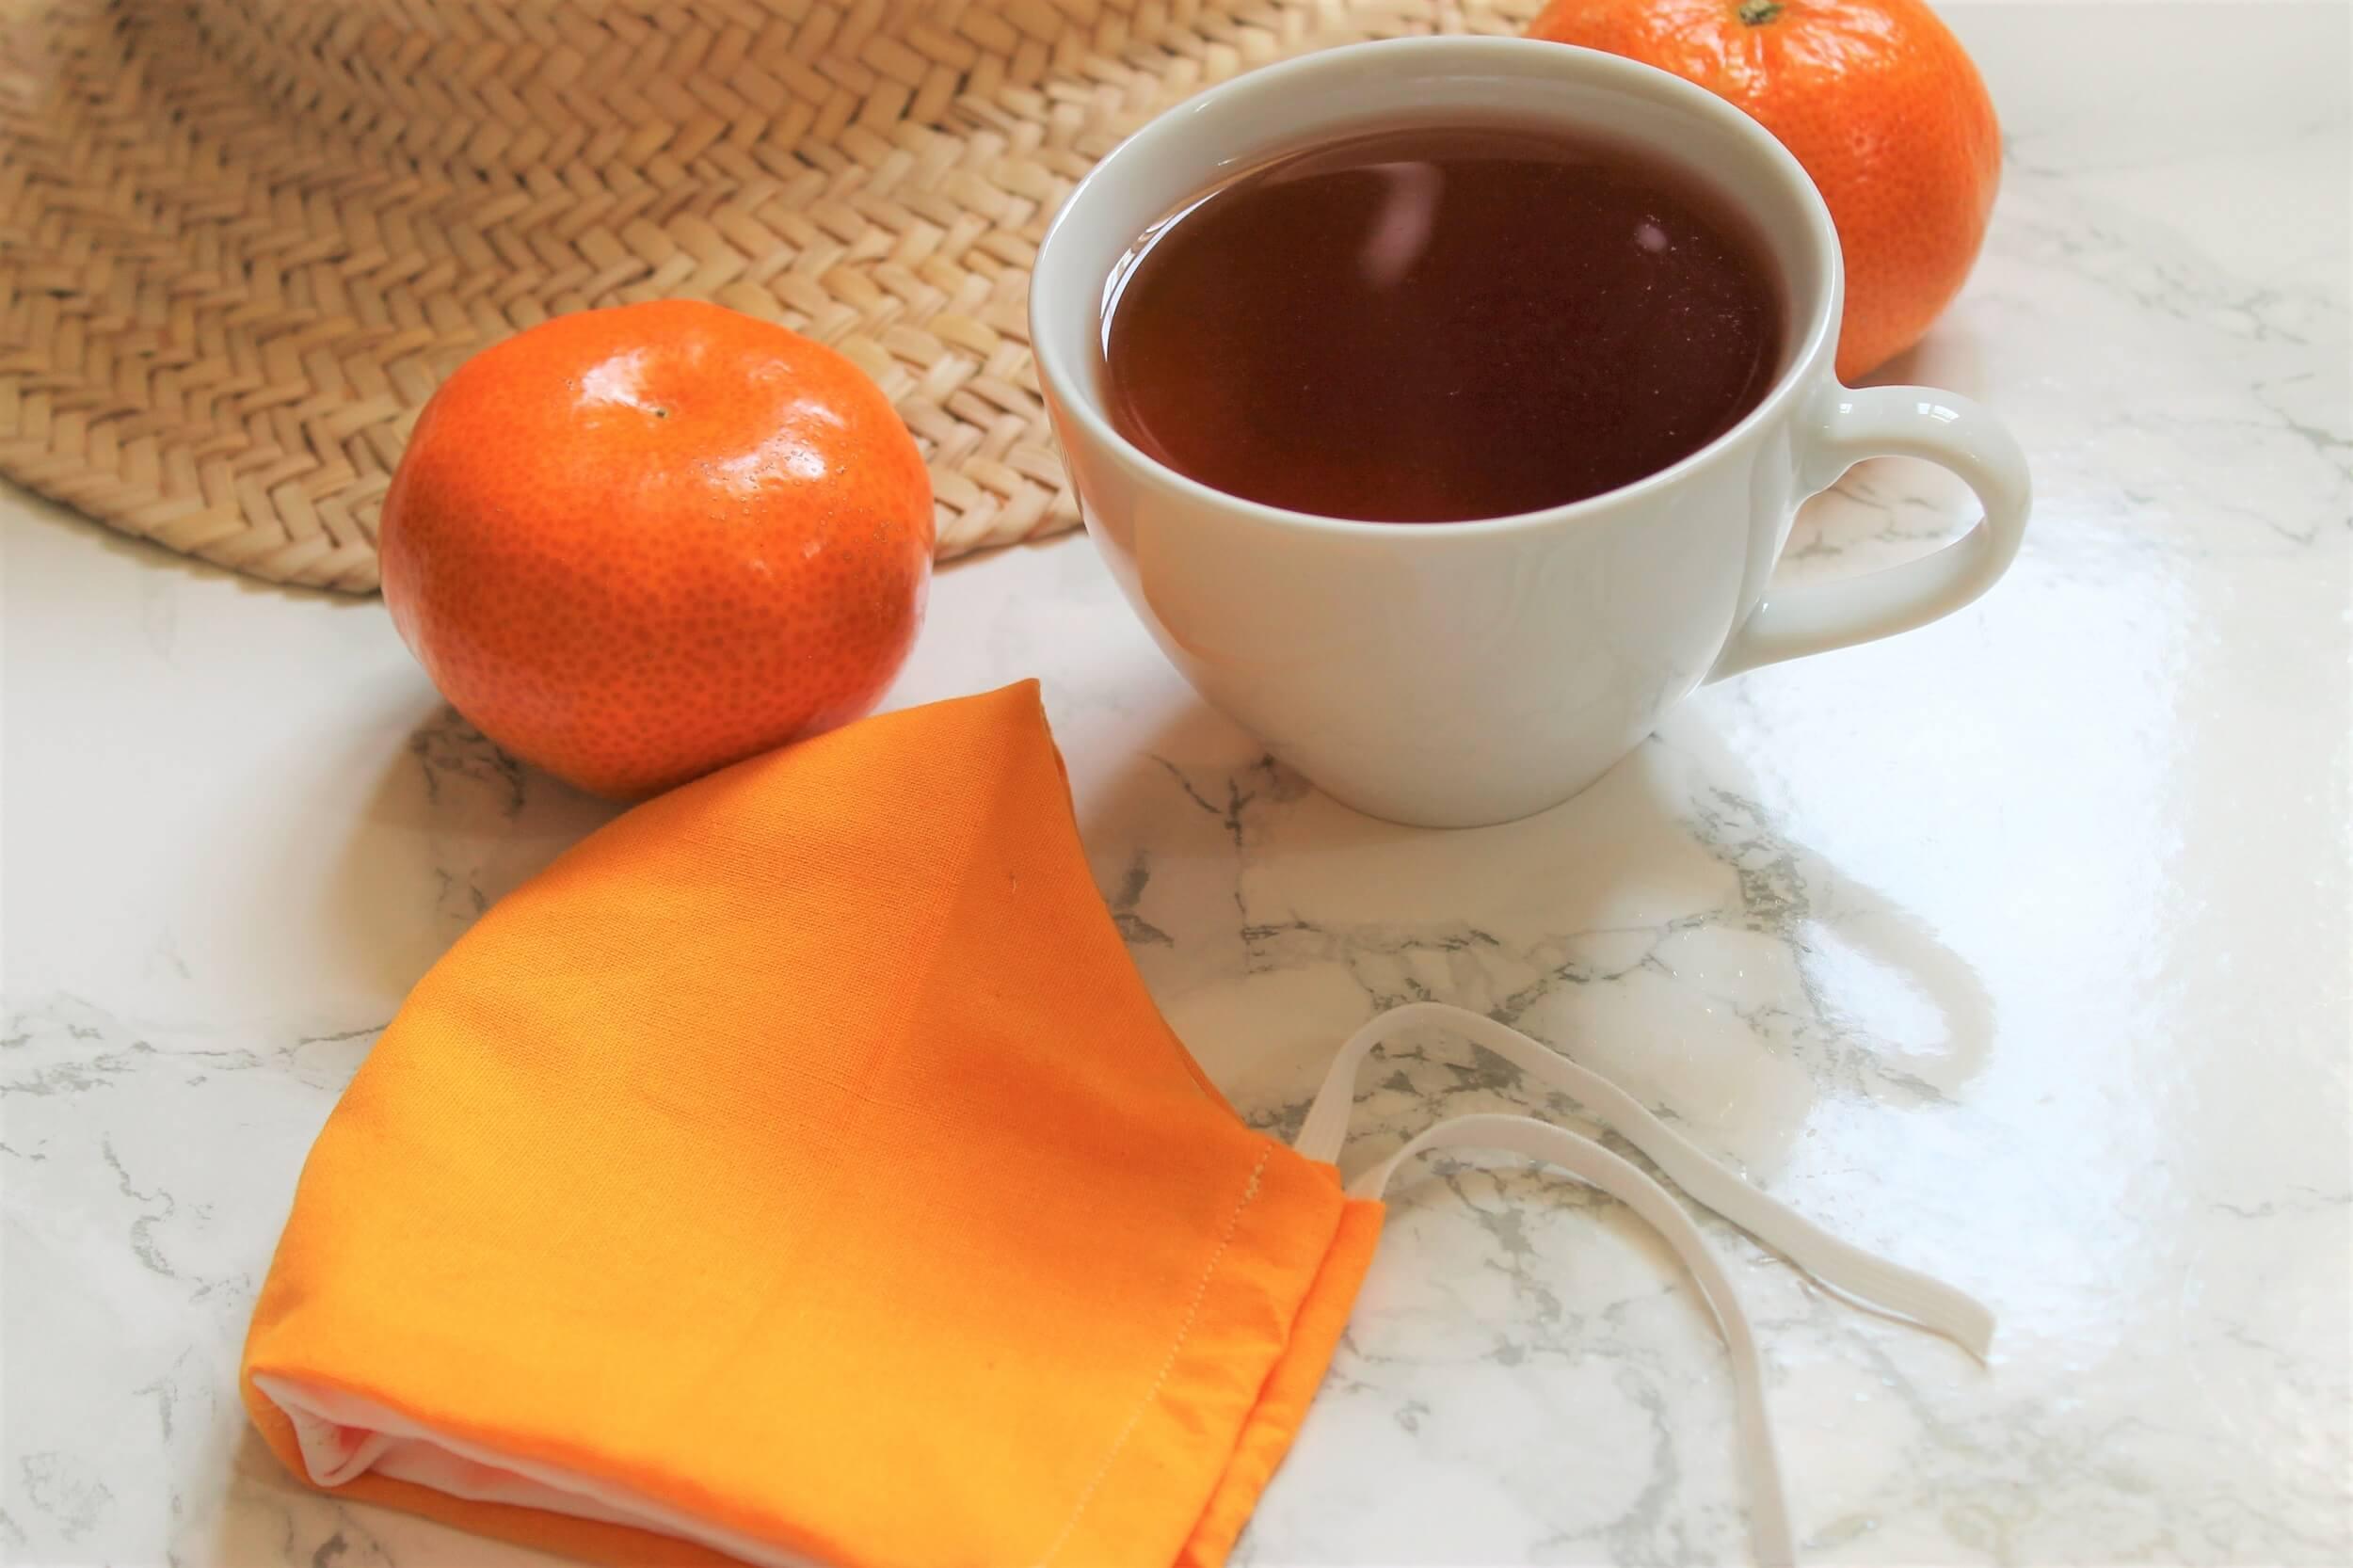 satsuma with orange tea in white teacup